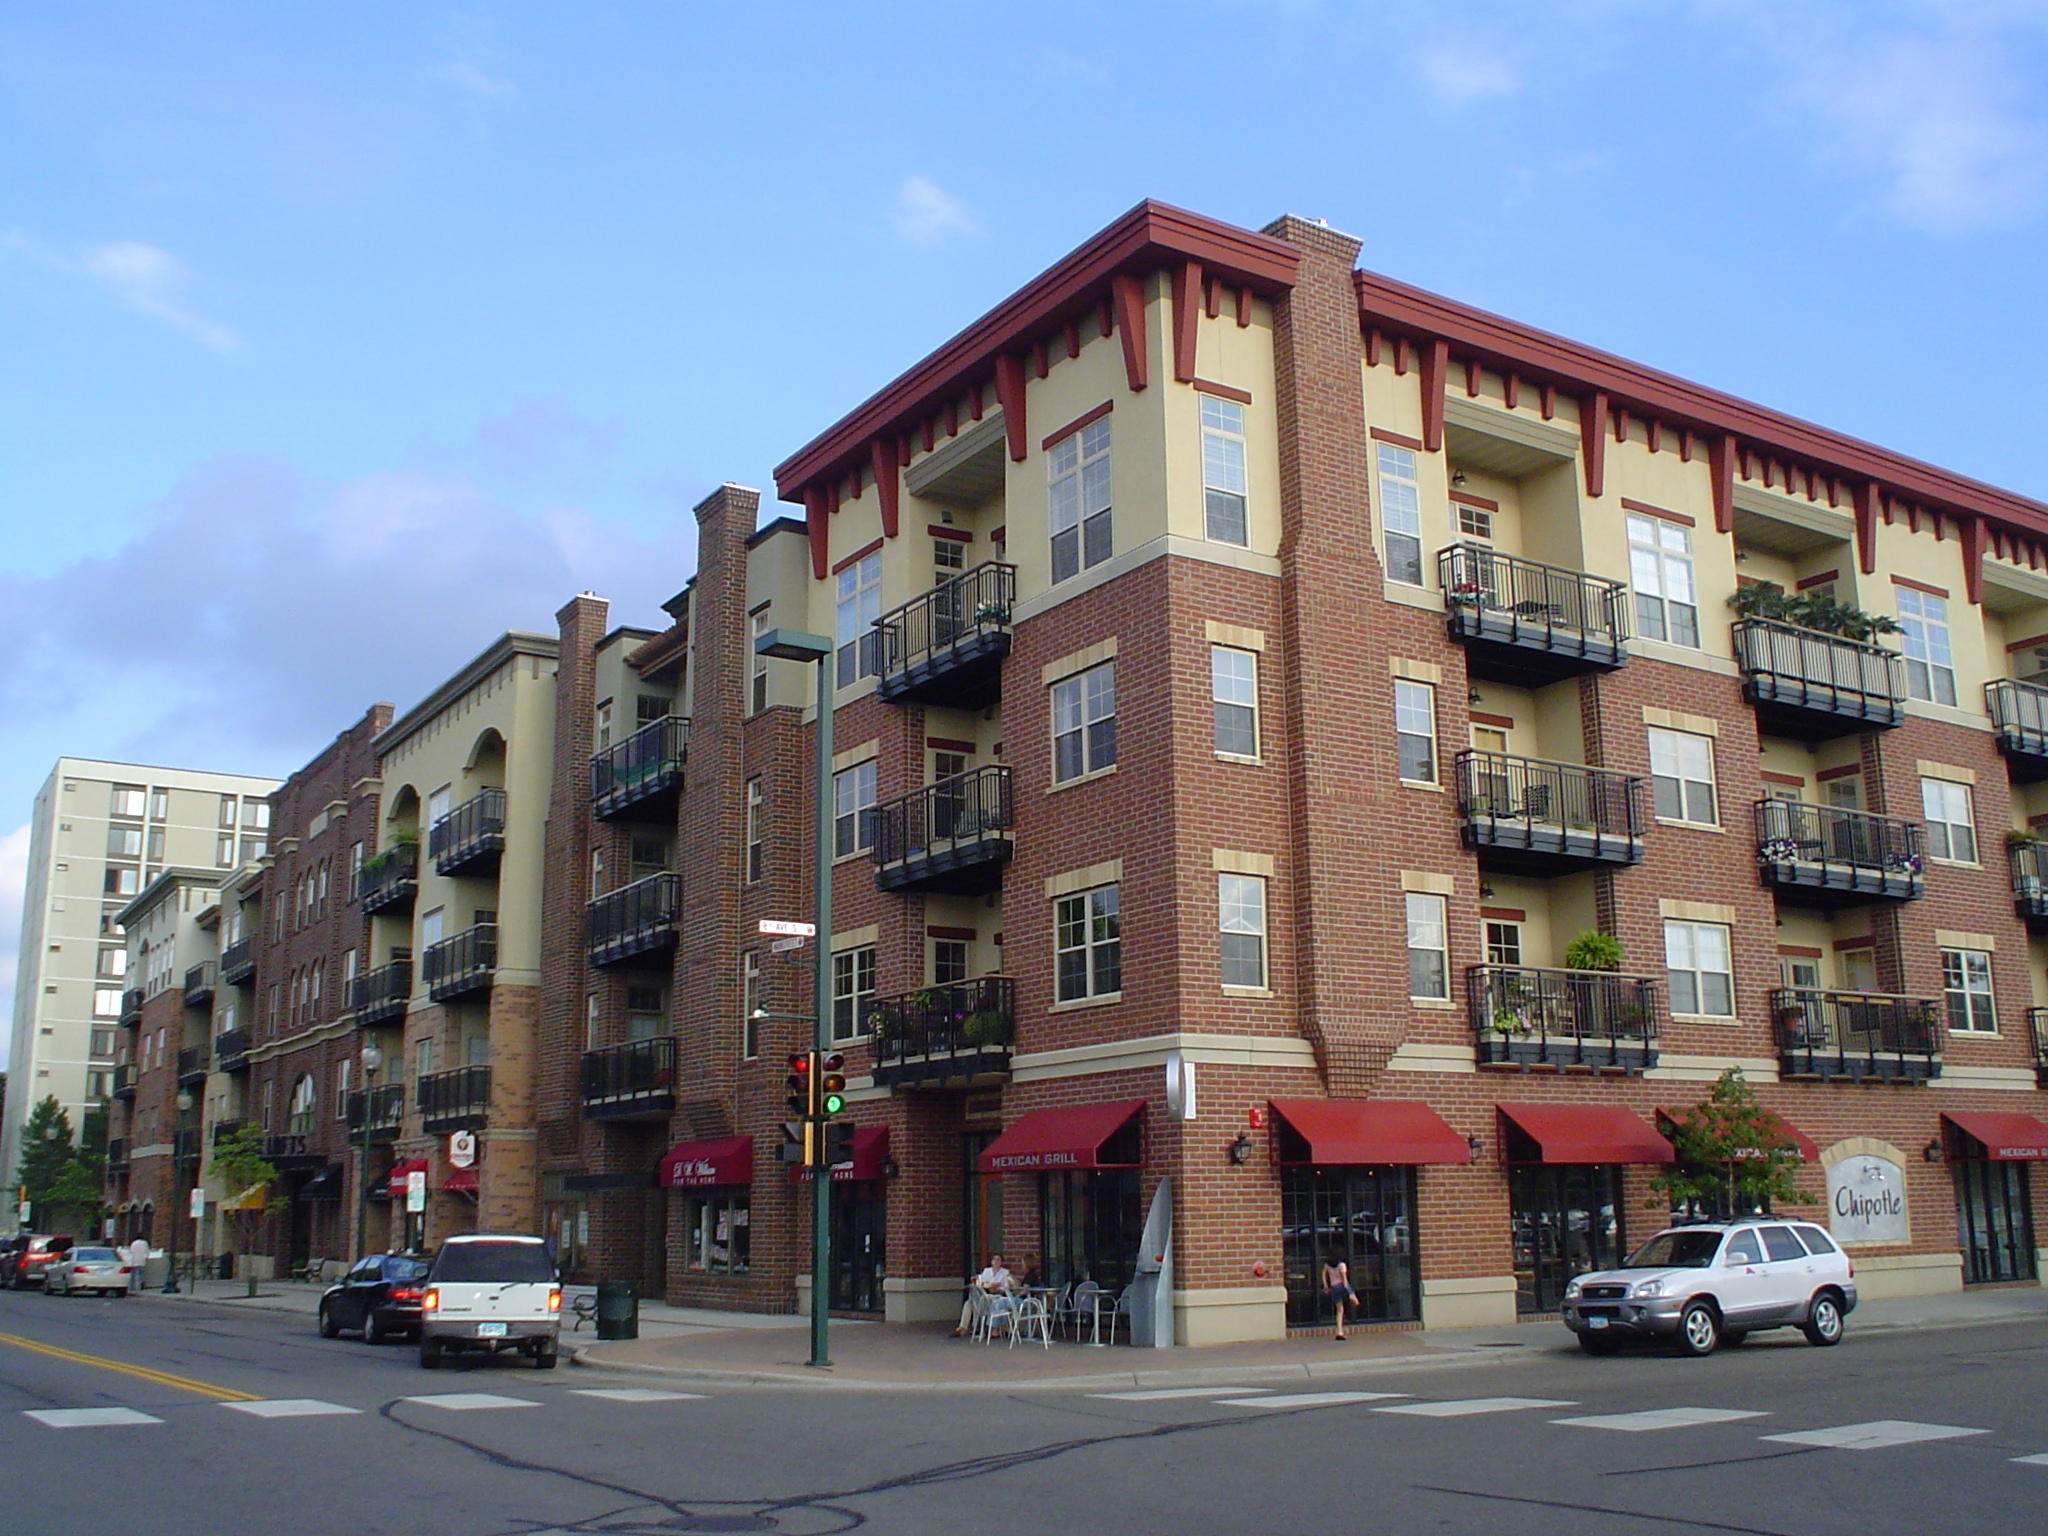 Marketplace lofts in Hopkins